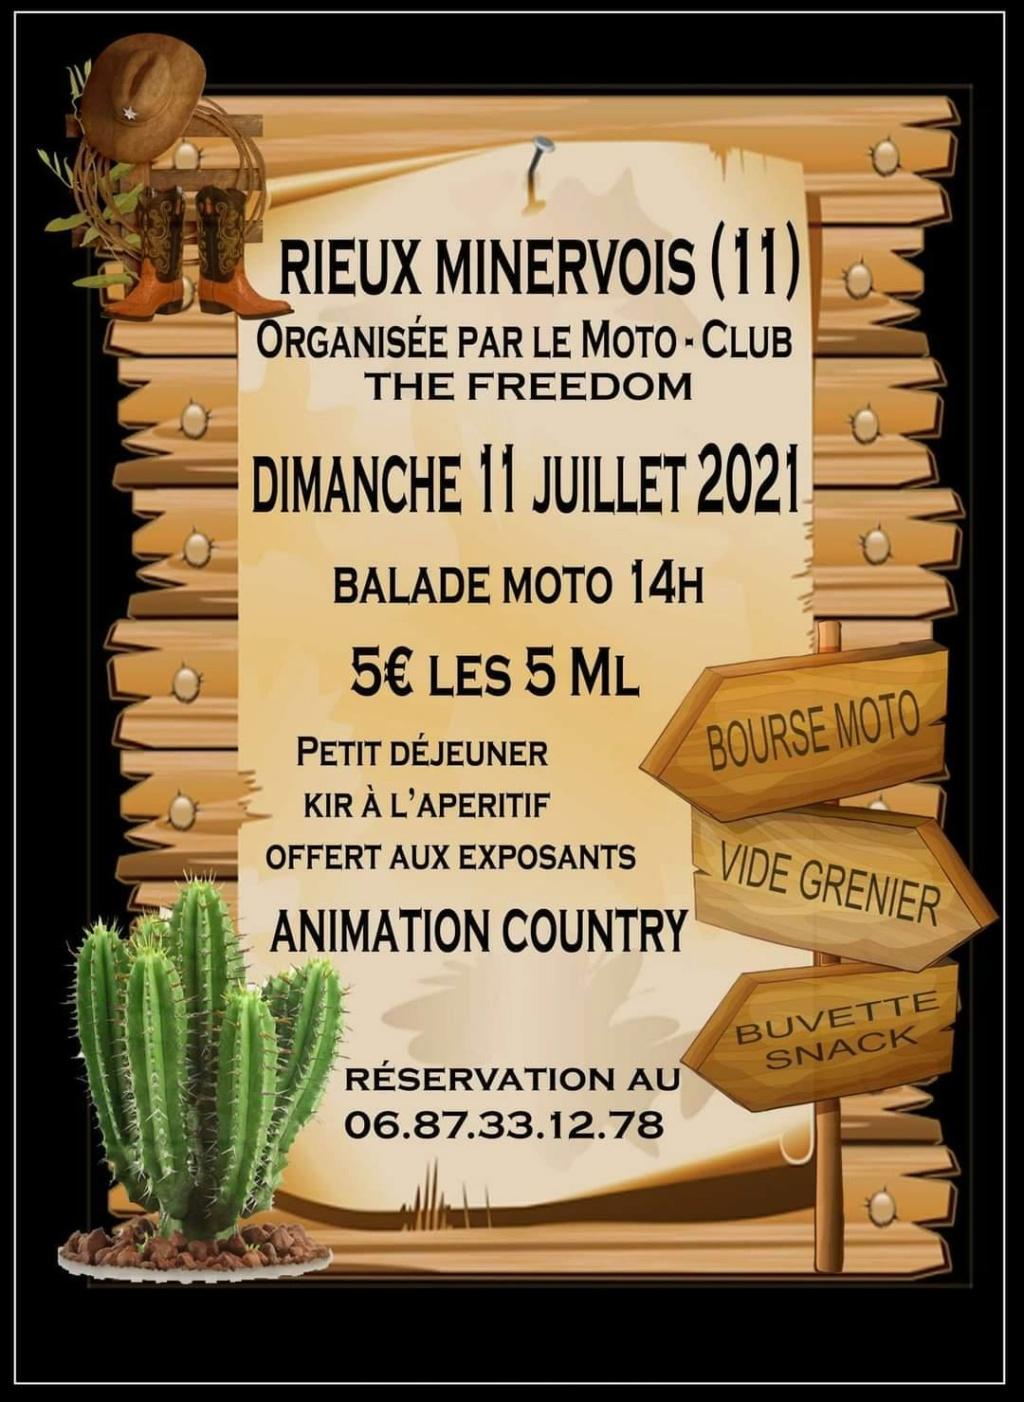 MANIFESTATION - Bourse Moto & Balade Moto . Dimanche 11 Juillet 2021 .Rieux Minervois (11) Balad144